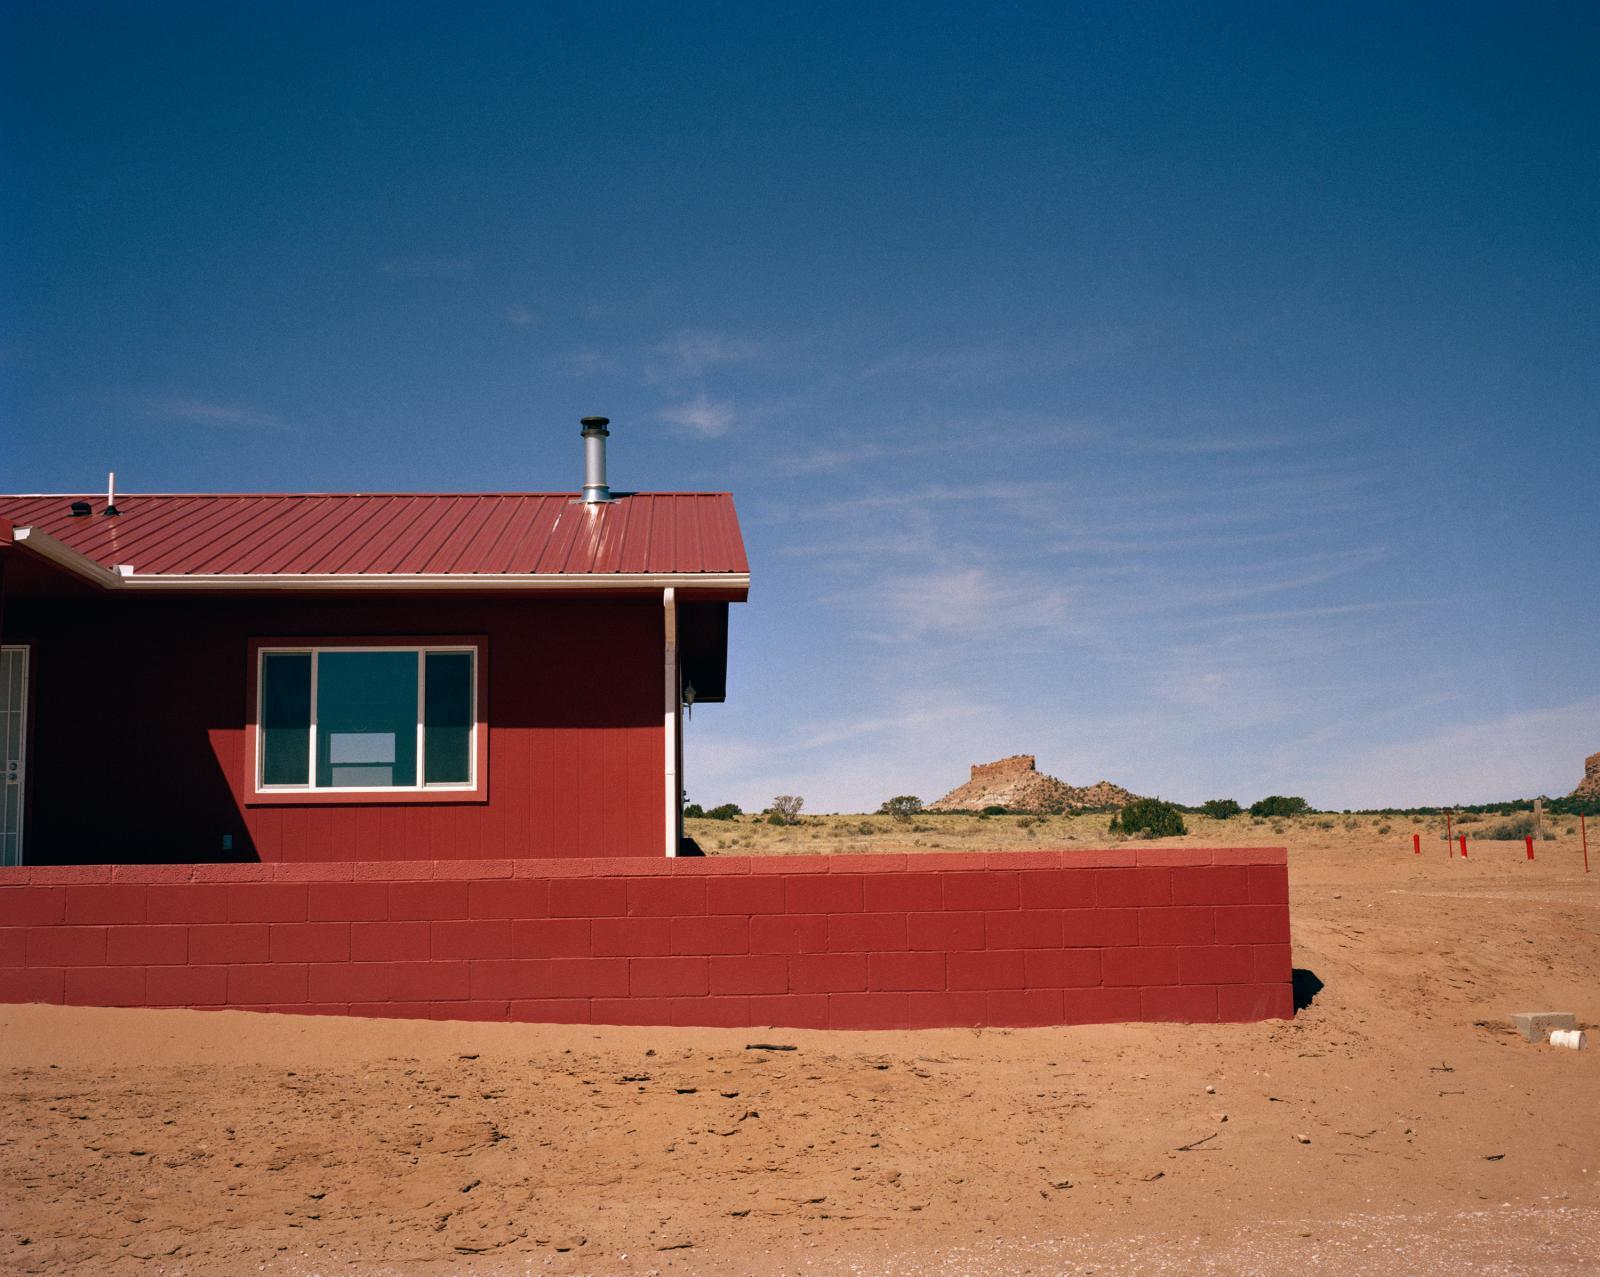 Haystack, New Mexico, USA, April 2016